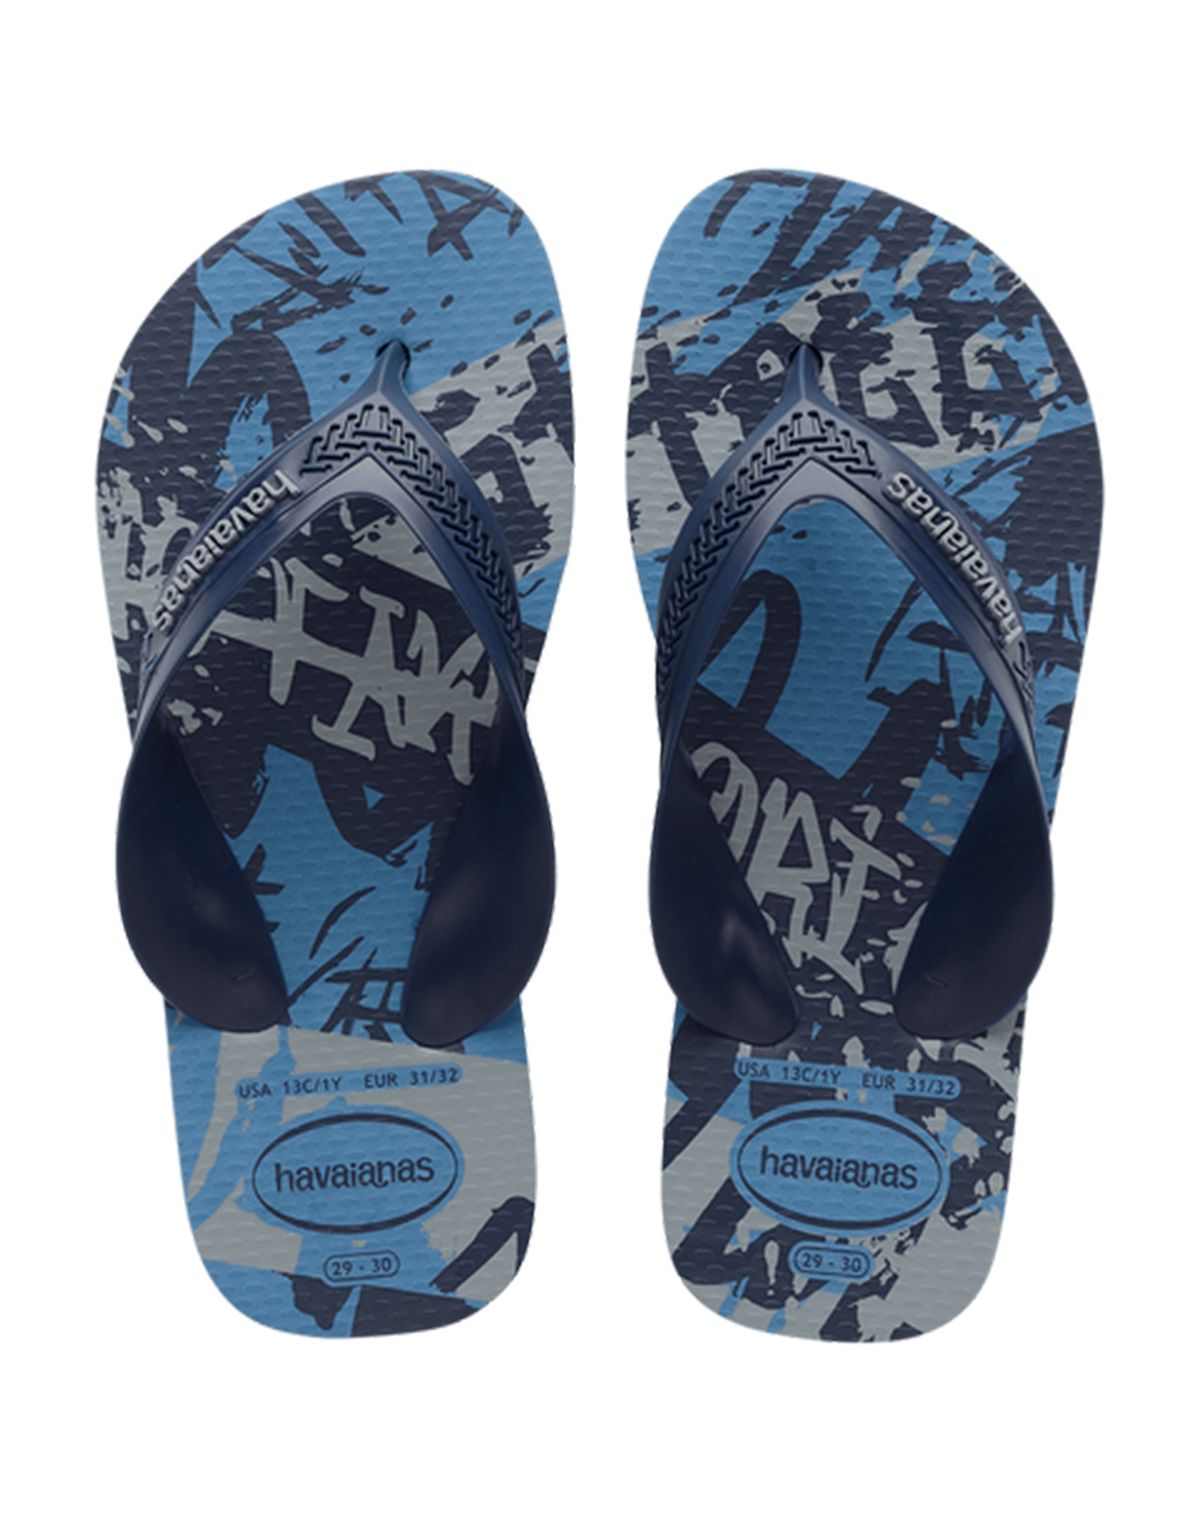 559034004-chinelo-infantil-menino-estampa-grafite-havaianas--kids--max-street-azul-33-4-37d